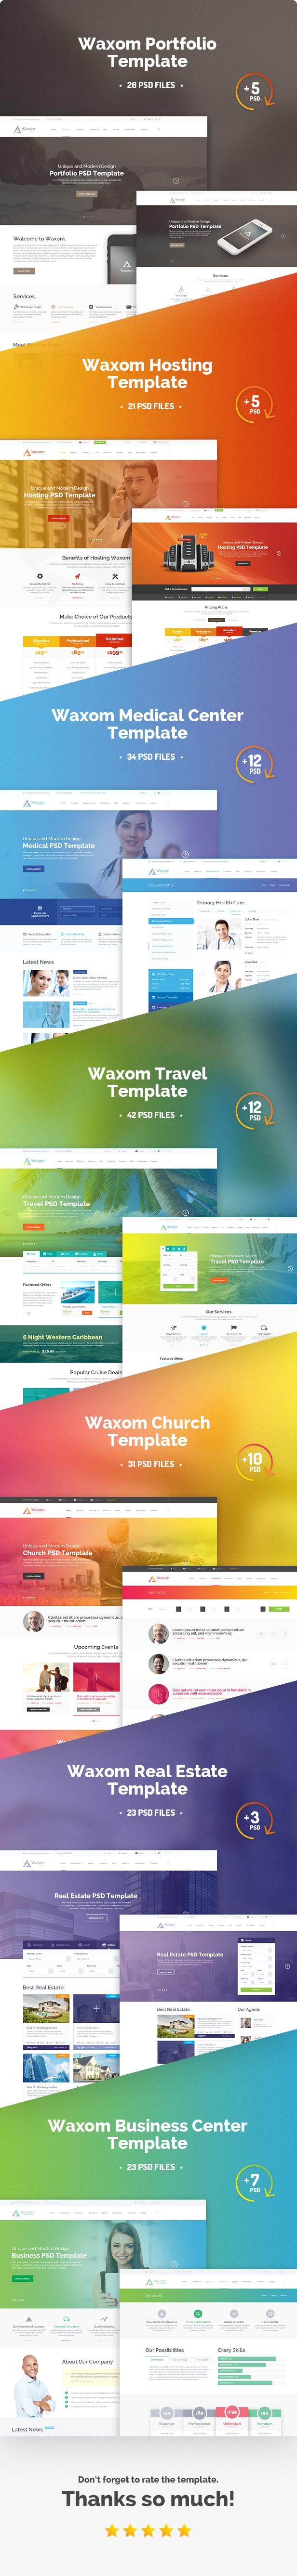 01 presentation - Waxom - Clean & Universal PSD Template